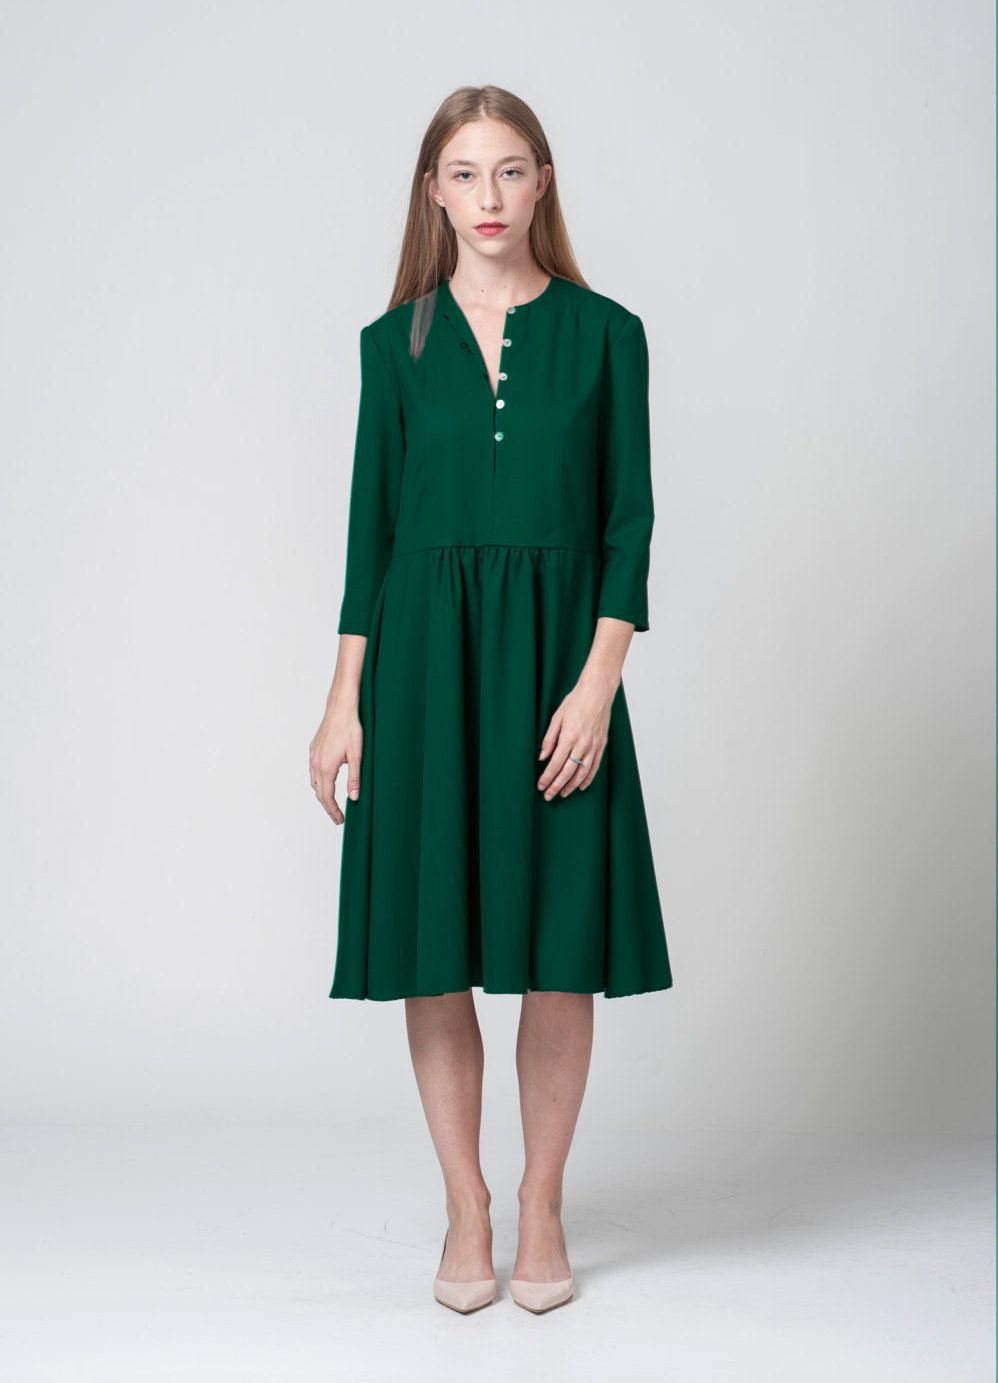 Emerald Midi Dress Engagement Midi Dress Long Sleeves Pleated Green Dress By Noisefashion On Etsy Taupe Midi Dress Dresses Long Sleeve Midi Dress [ 1383 x 998 Pixel ]